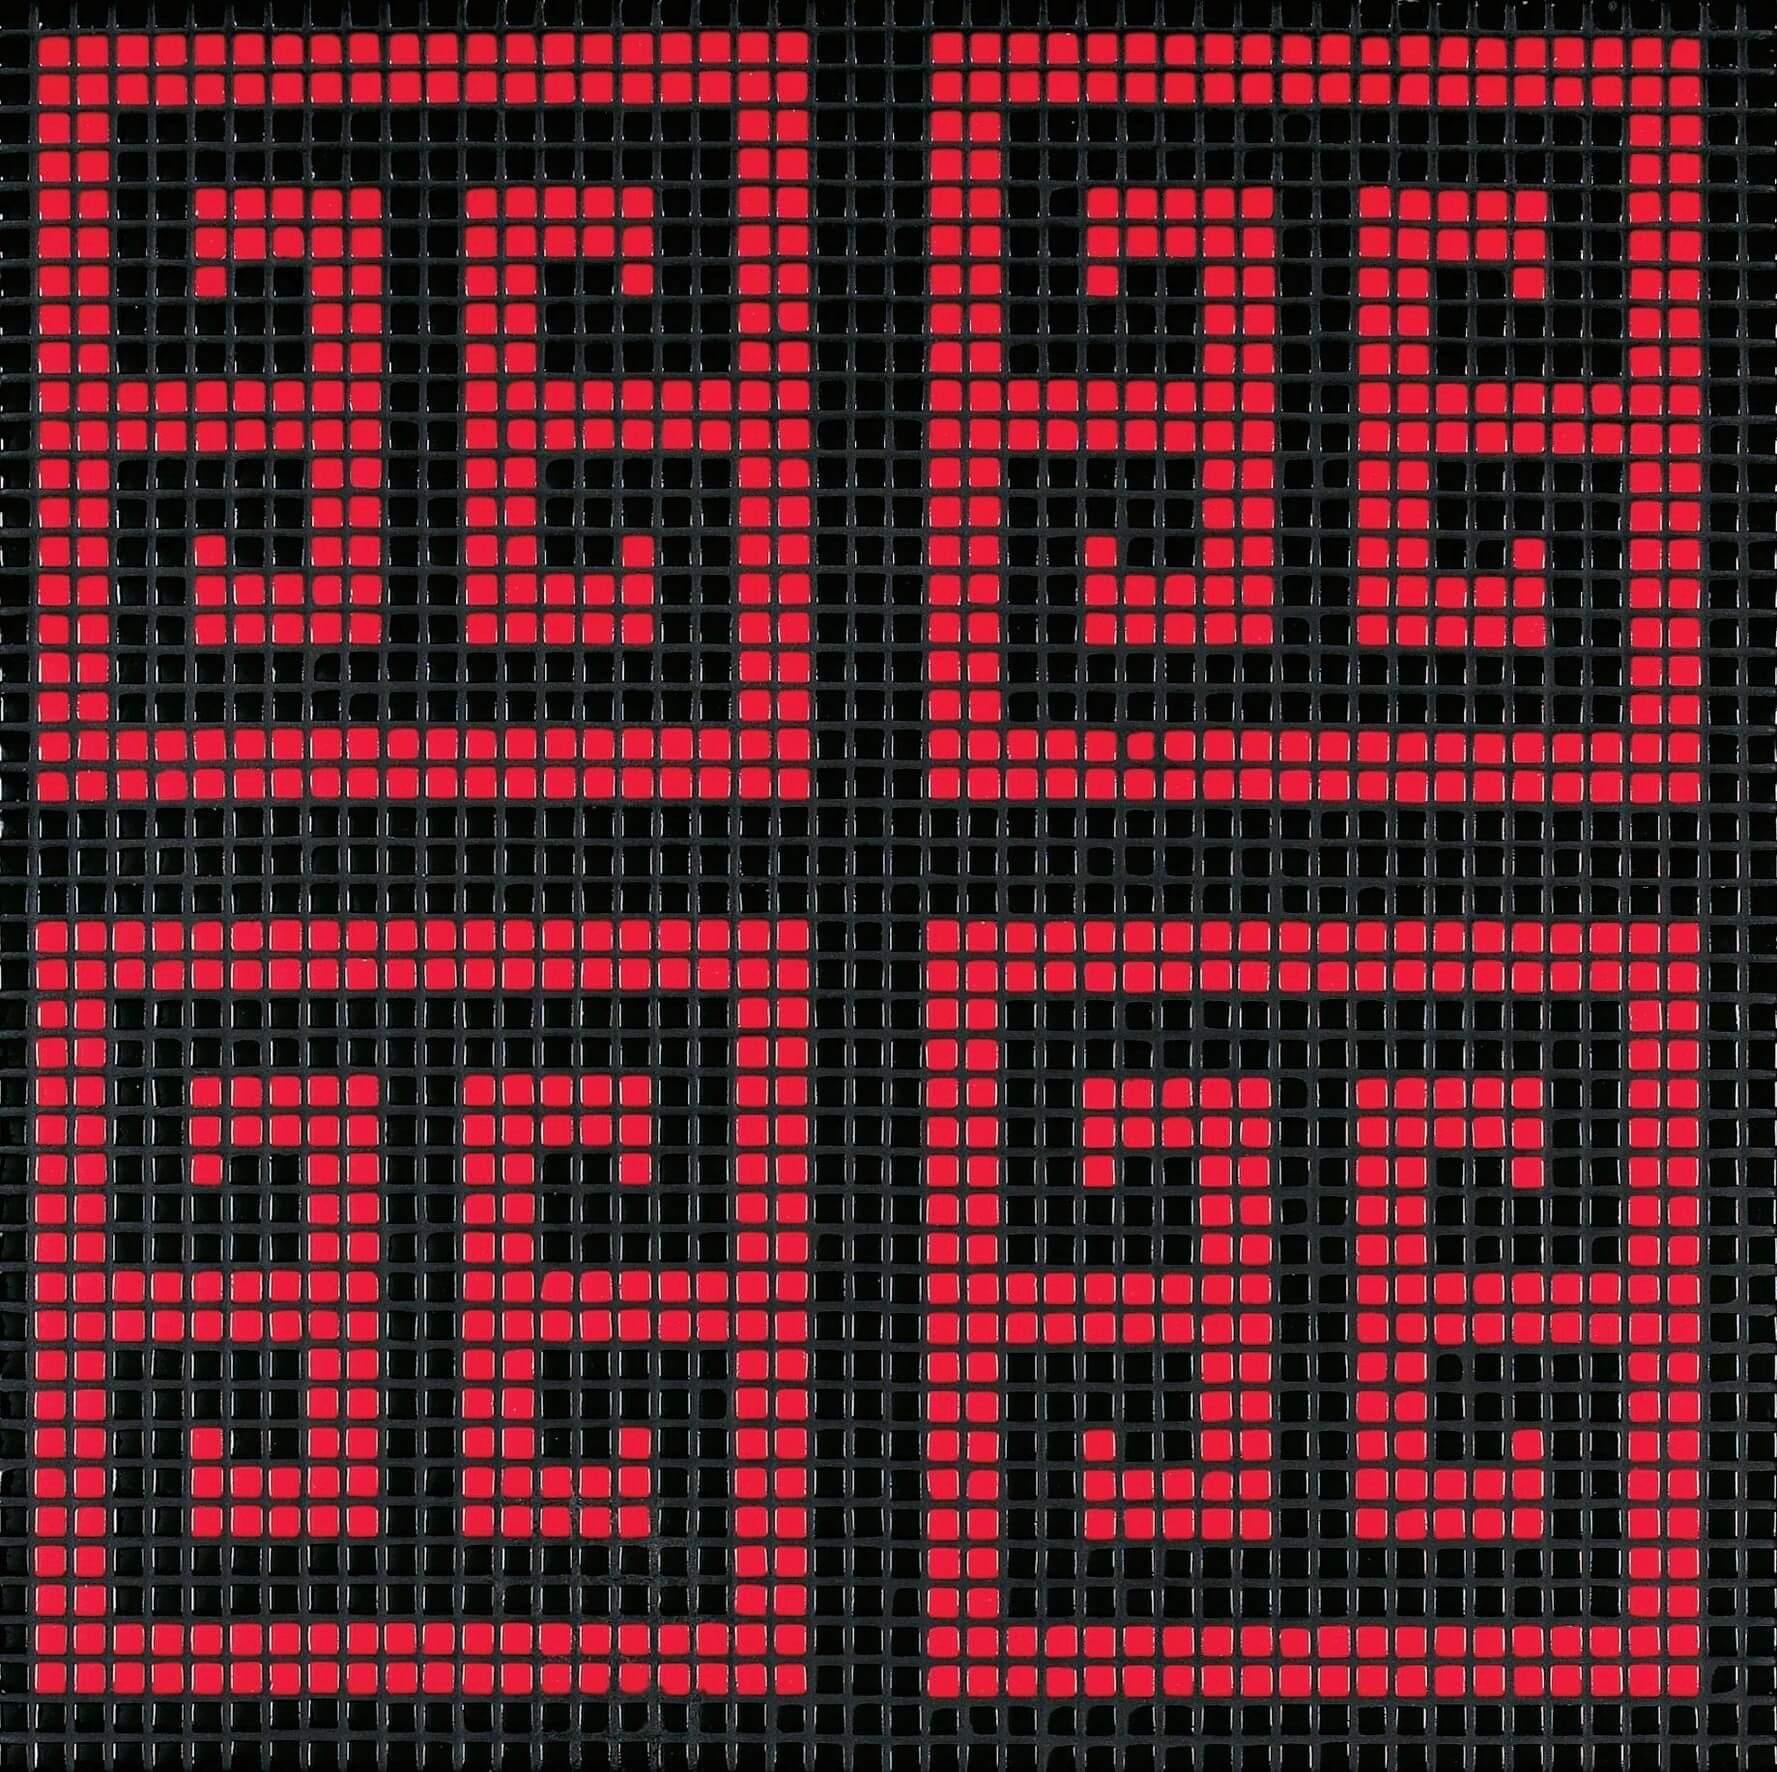 Key Red